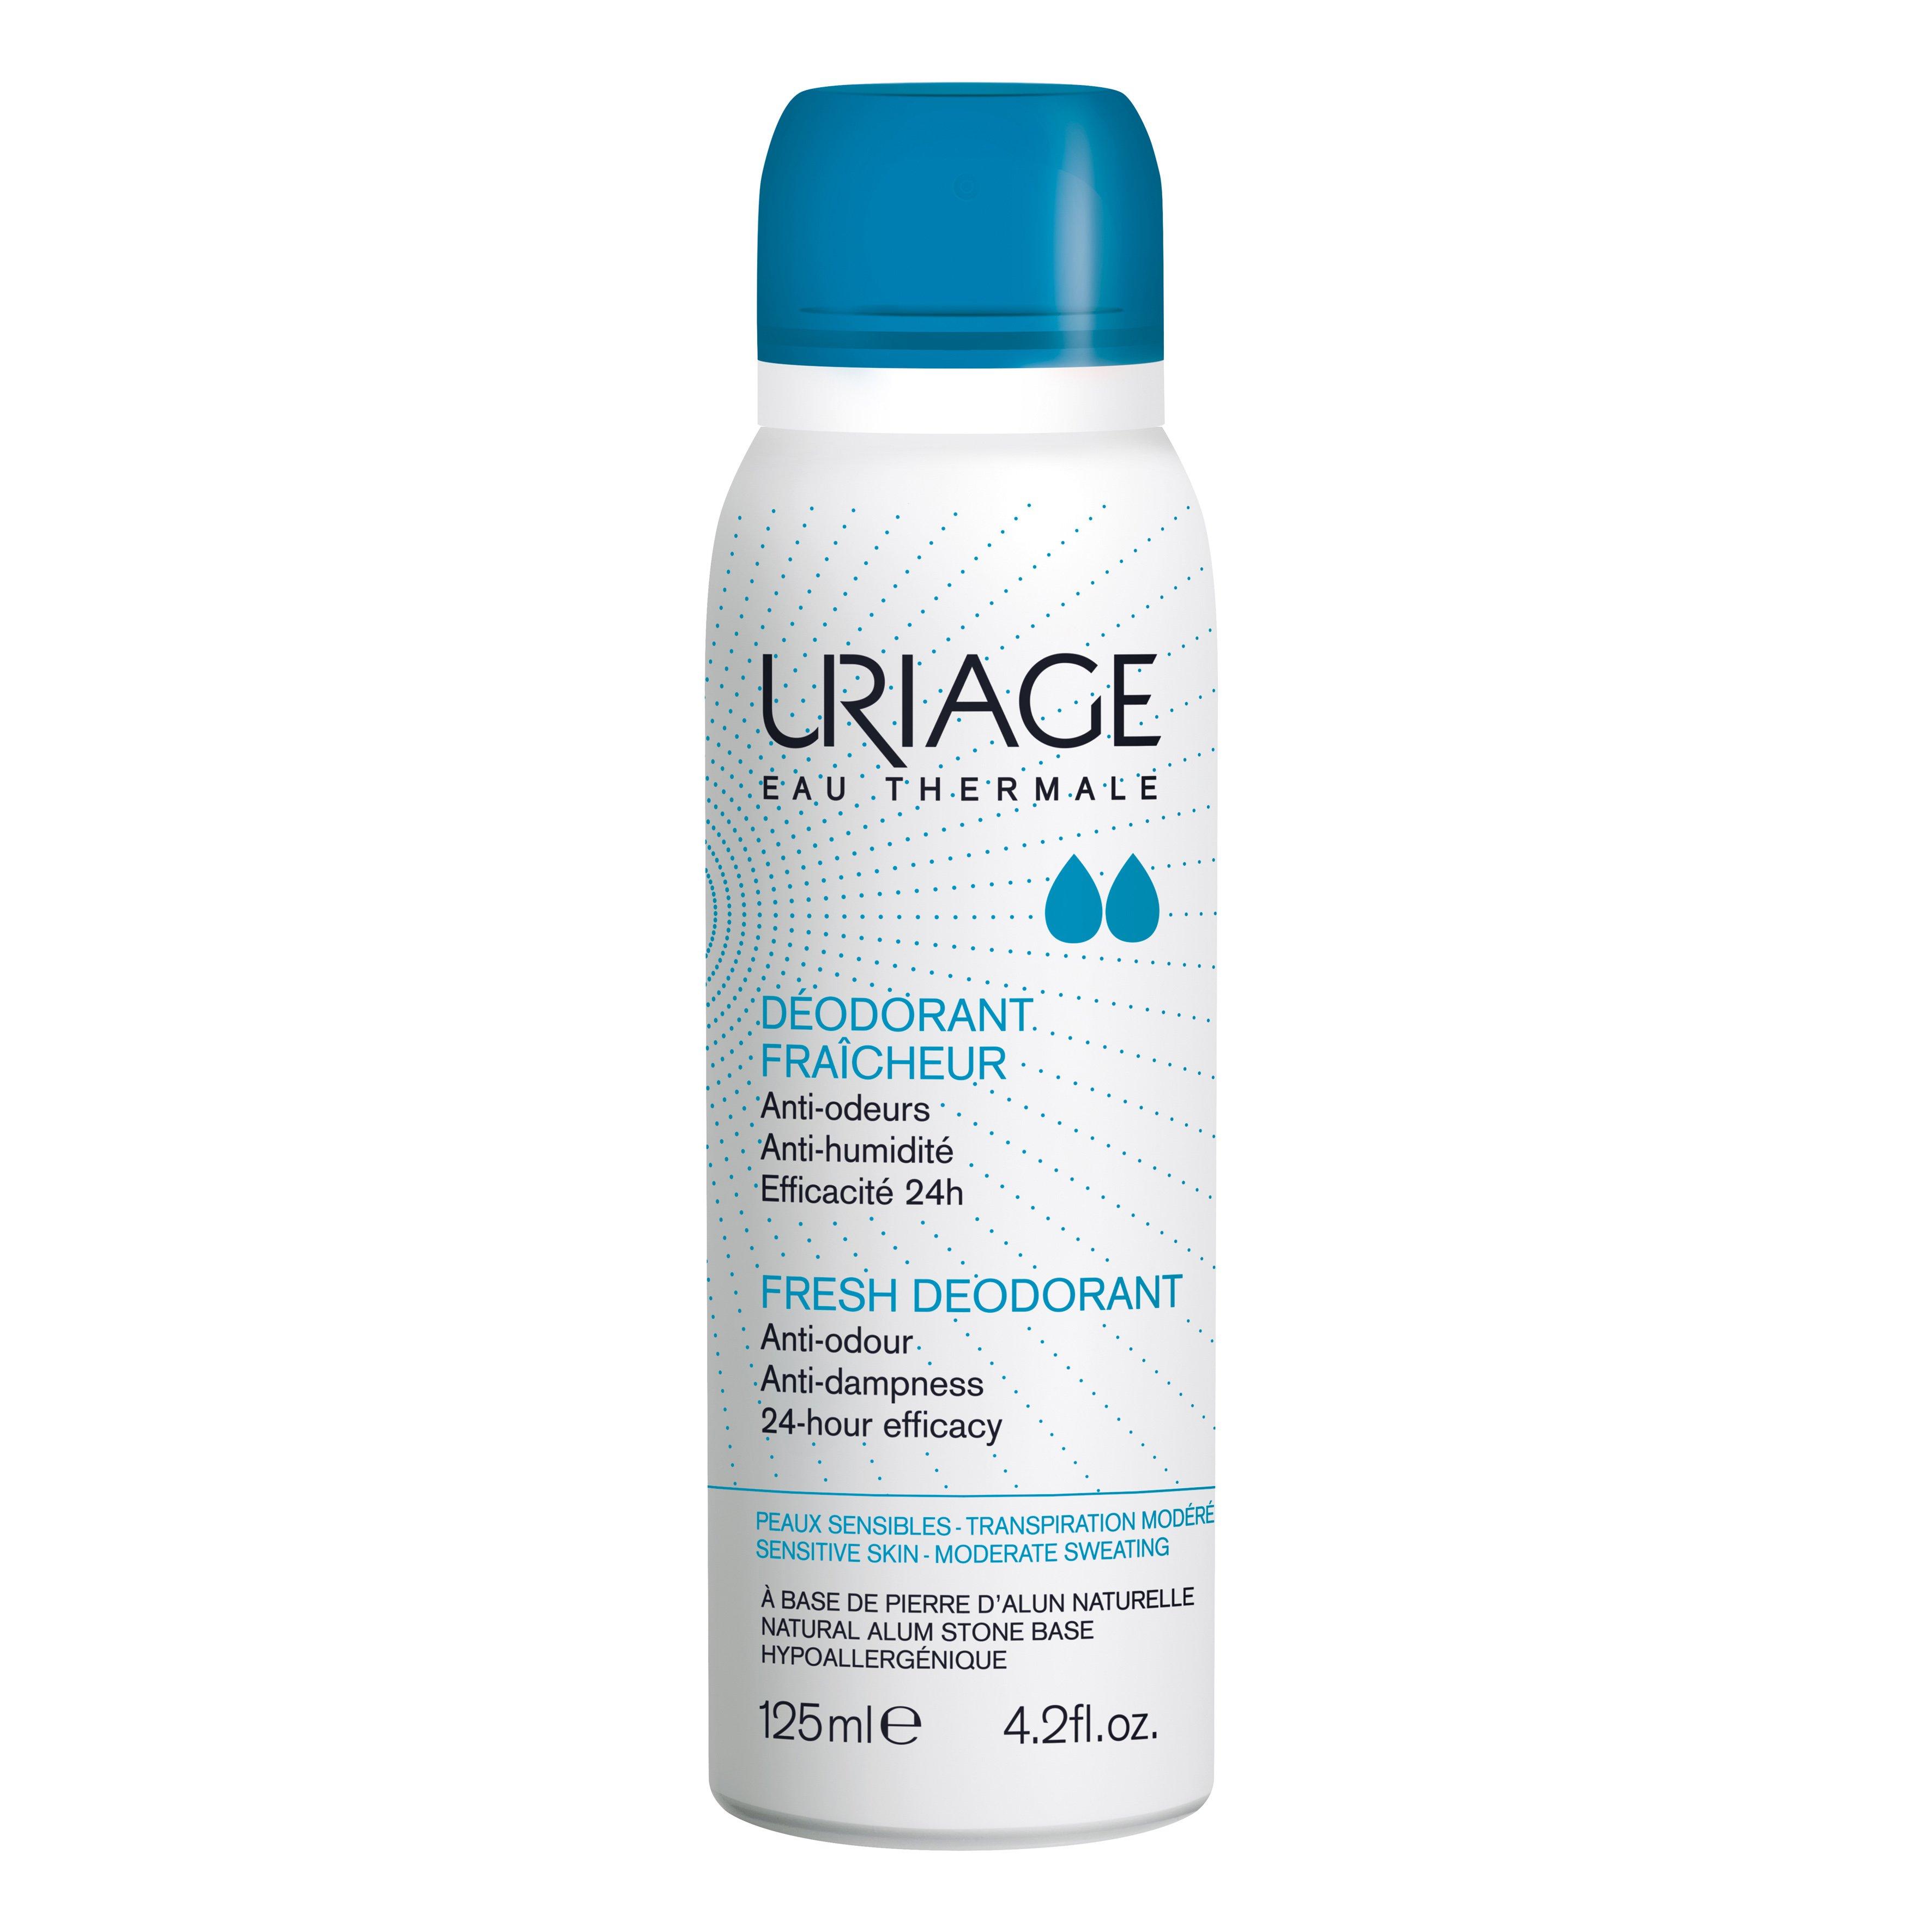 Uriage Eau Thermale Fresh Deodorant Προσφέρει Διπλή 24ωρη Δράση Ενάντια στις Οσμές και την Εφίδρωση 125ml